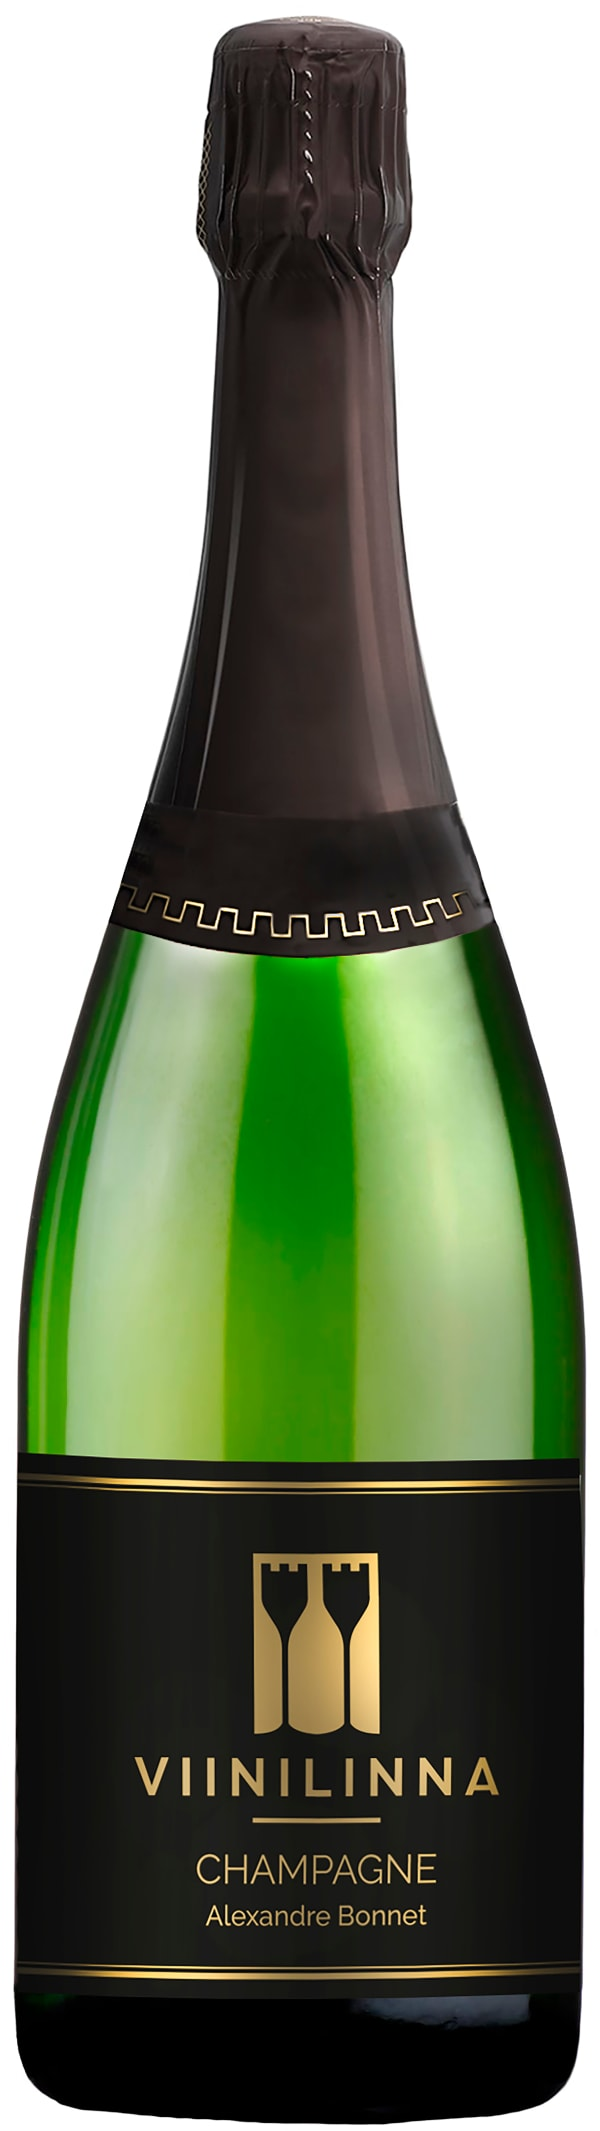 Viinilinna Champagne Brut